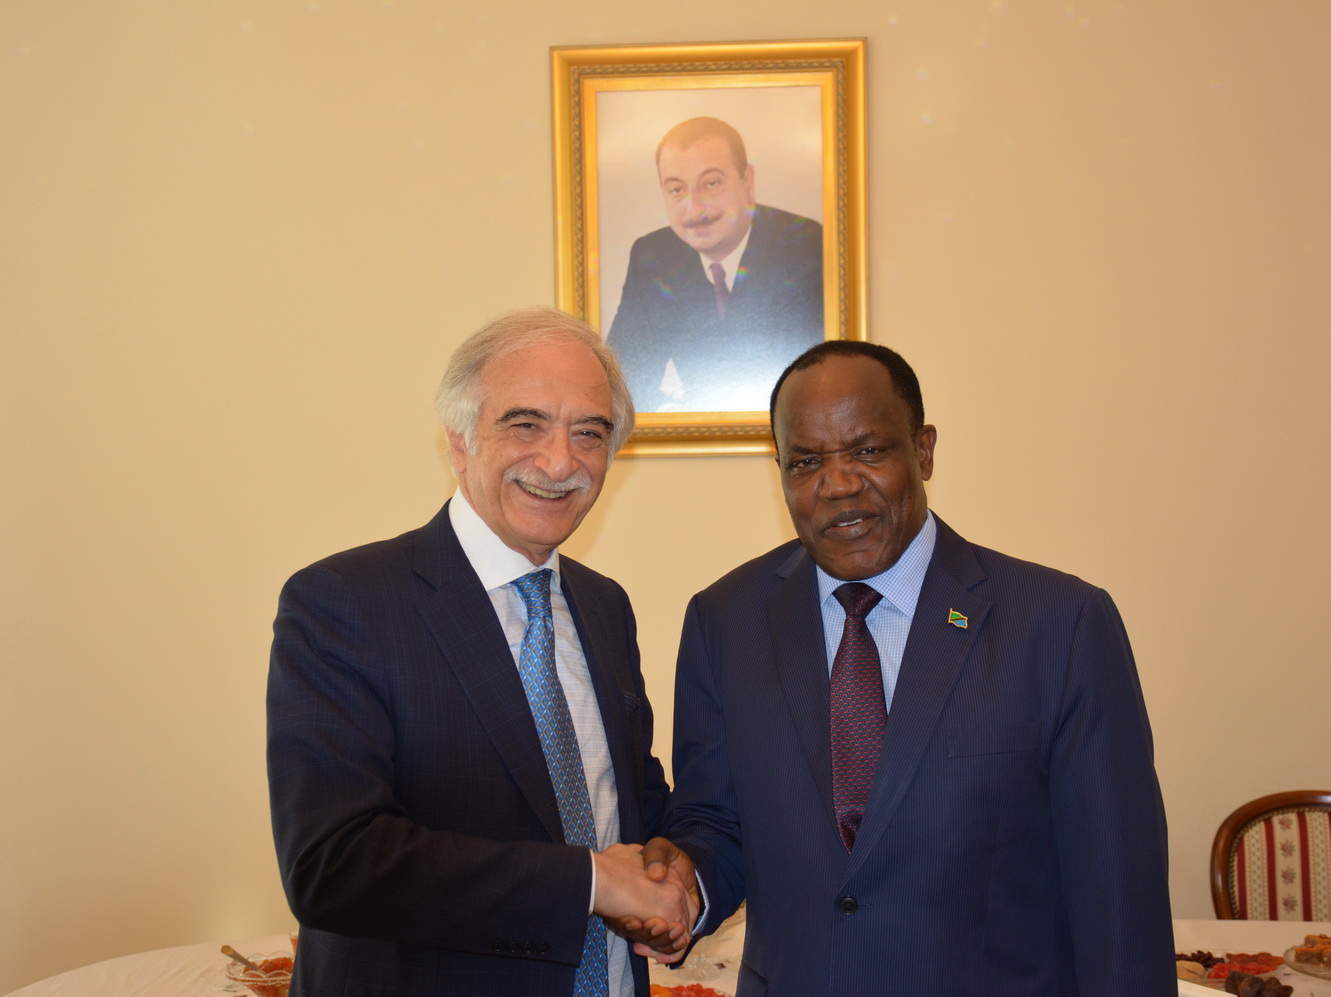 Полад Бюльбюльоглу встретился с послом Танзании в РФ - ФОТО